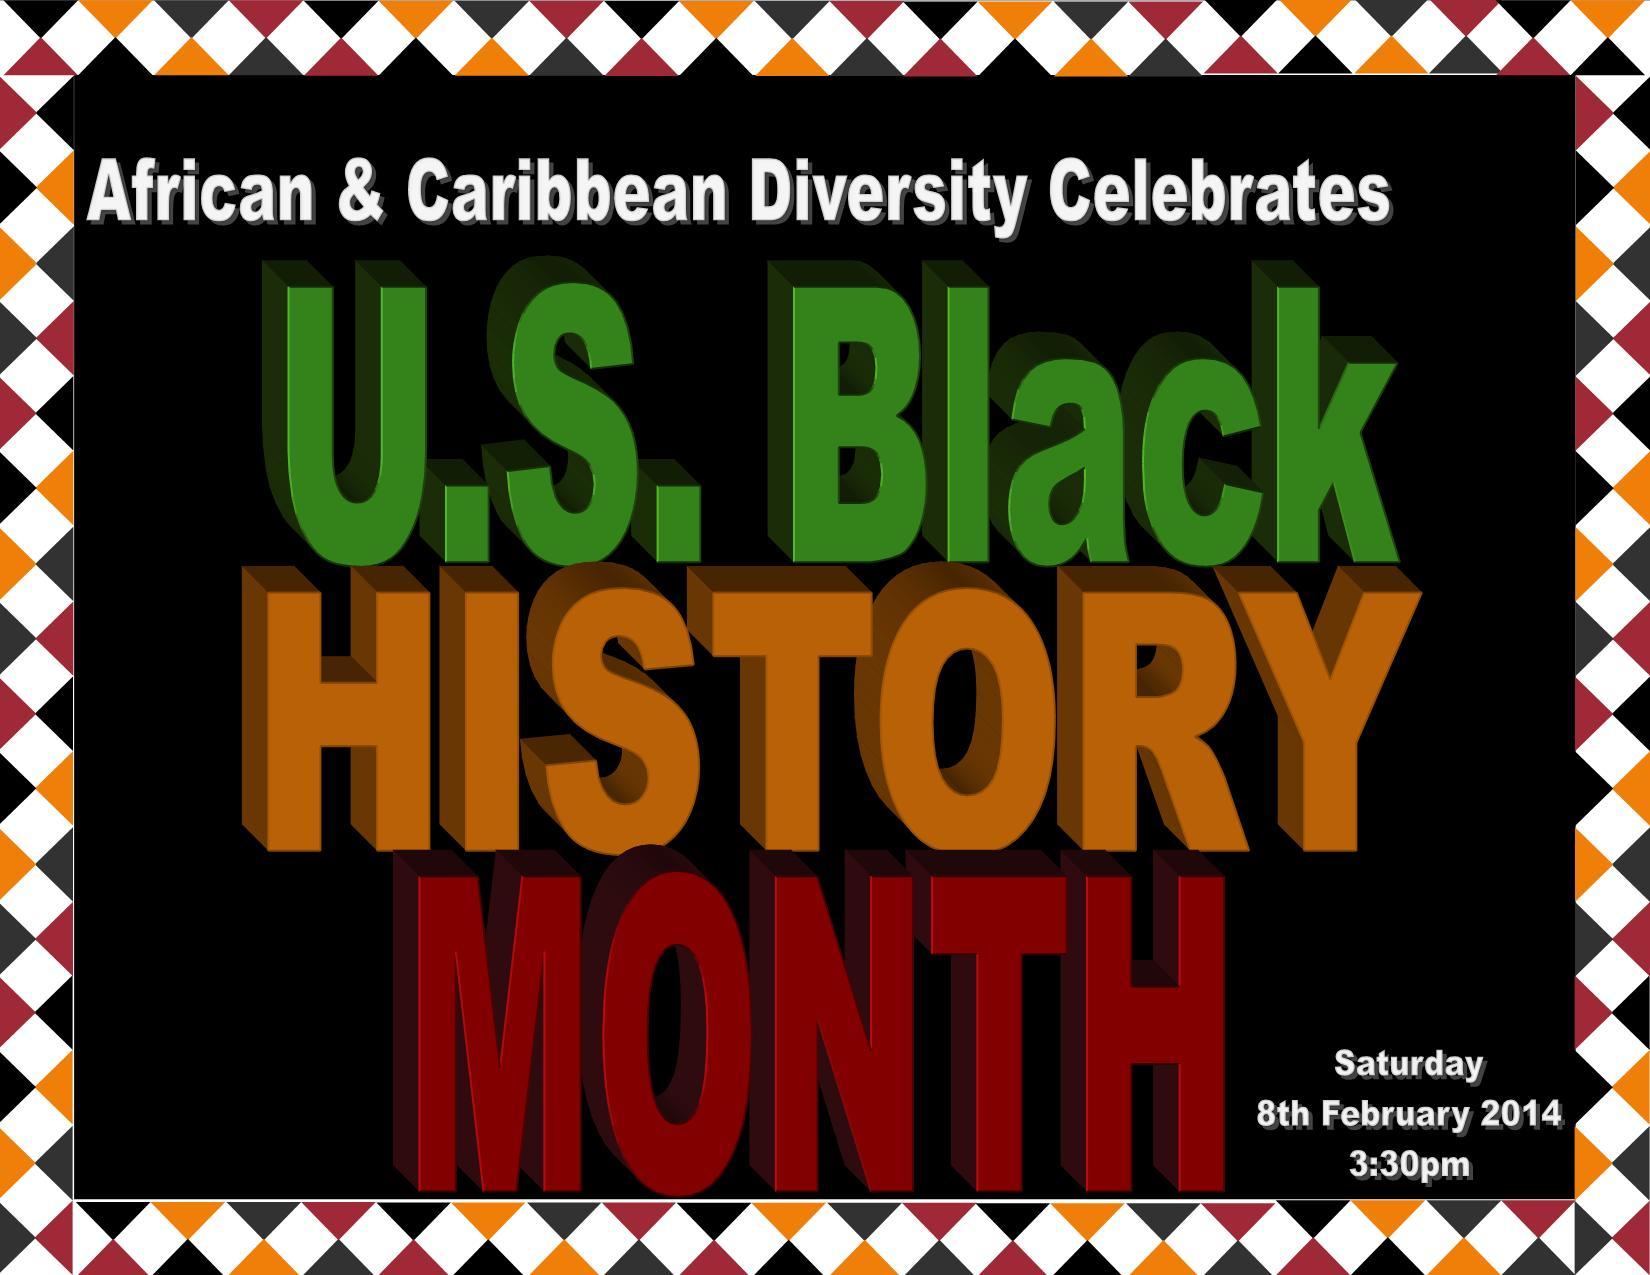 African & Caribbean Diversity Celebrates U.S. Black History Month 2014